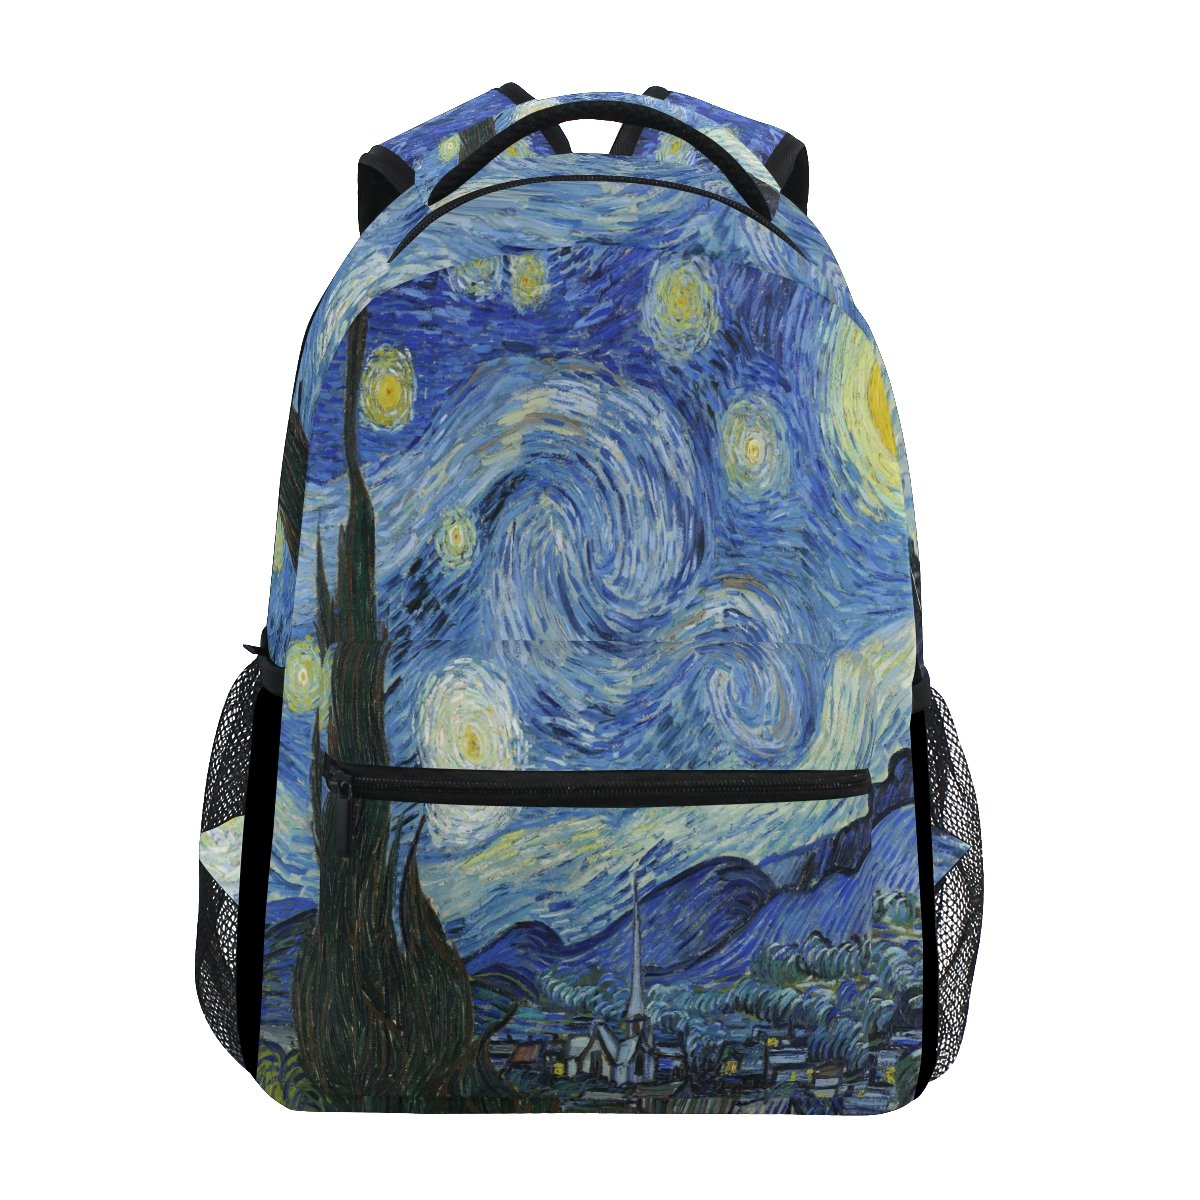 3ccd460d3013 Amazon.com  WXLIFE Van Gogh Starry Night Art Backpack Travel Shoulder Bag  for Boys Girls Women Men  Computers   Accessories